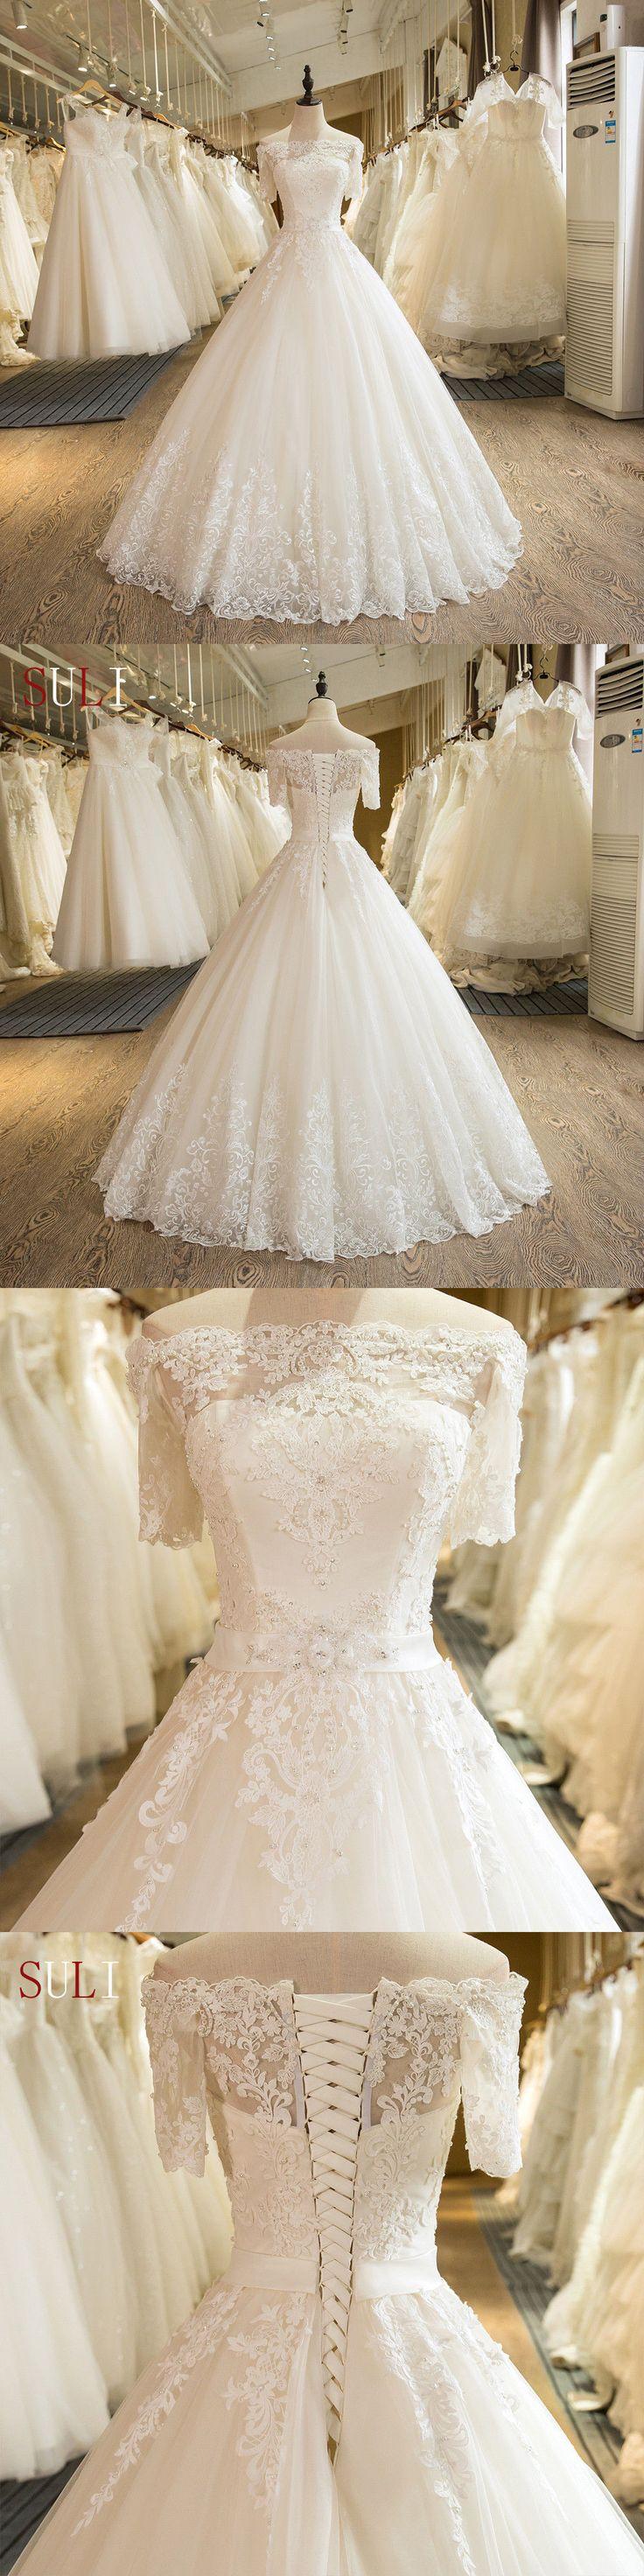 Wedding Dresses: New White Ivory Wedding Dress Bridal Gown Custom Size 6-8-10-12-14-16 18+ -> BUY IT NOW ONLY: $166 on eBay!